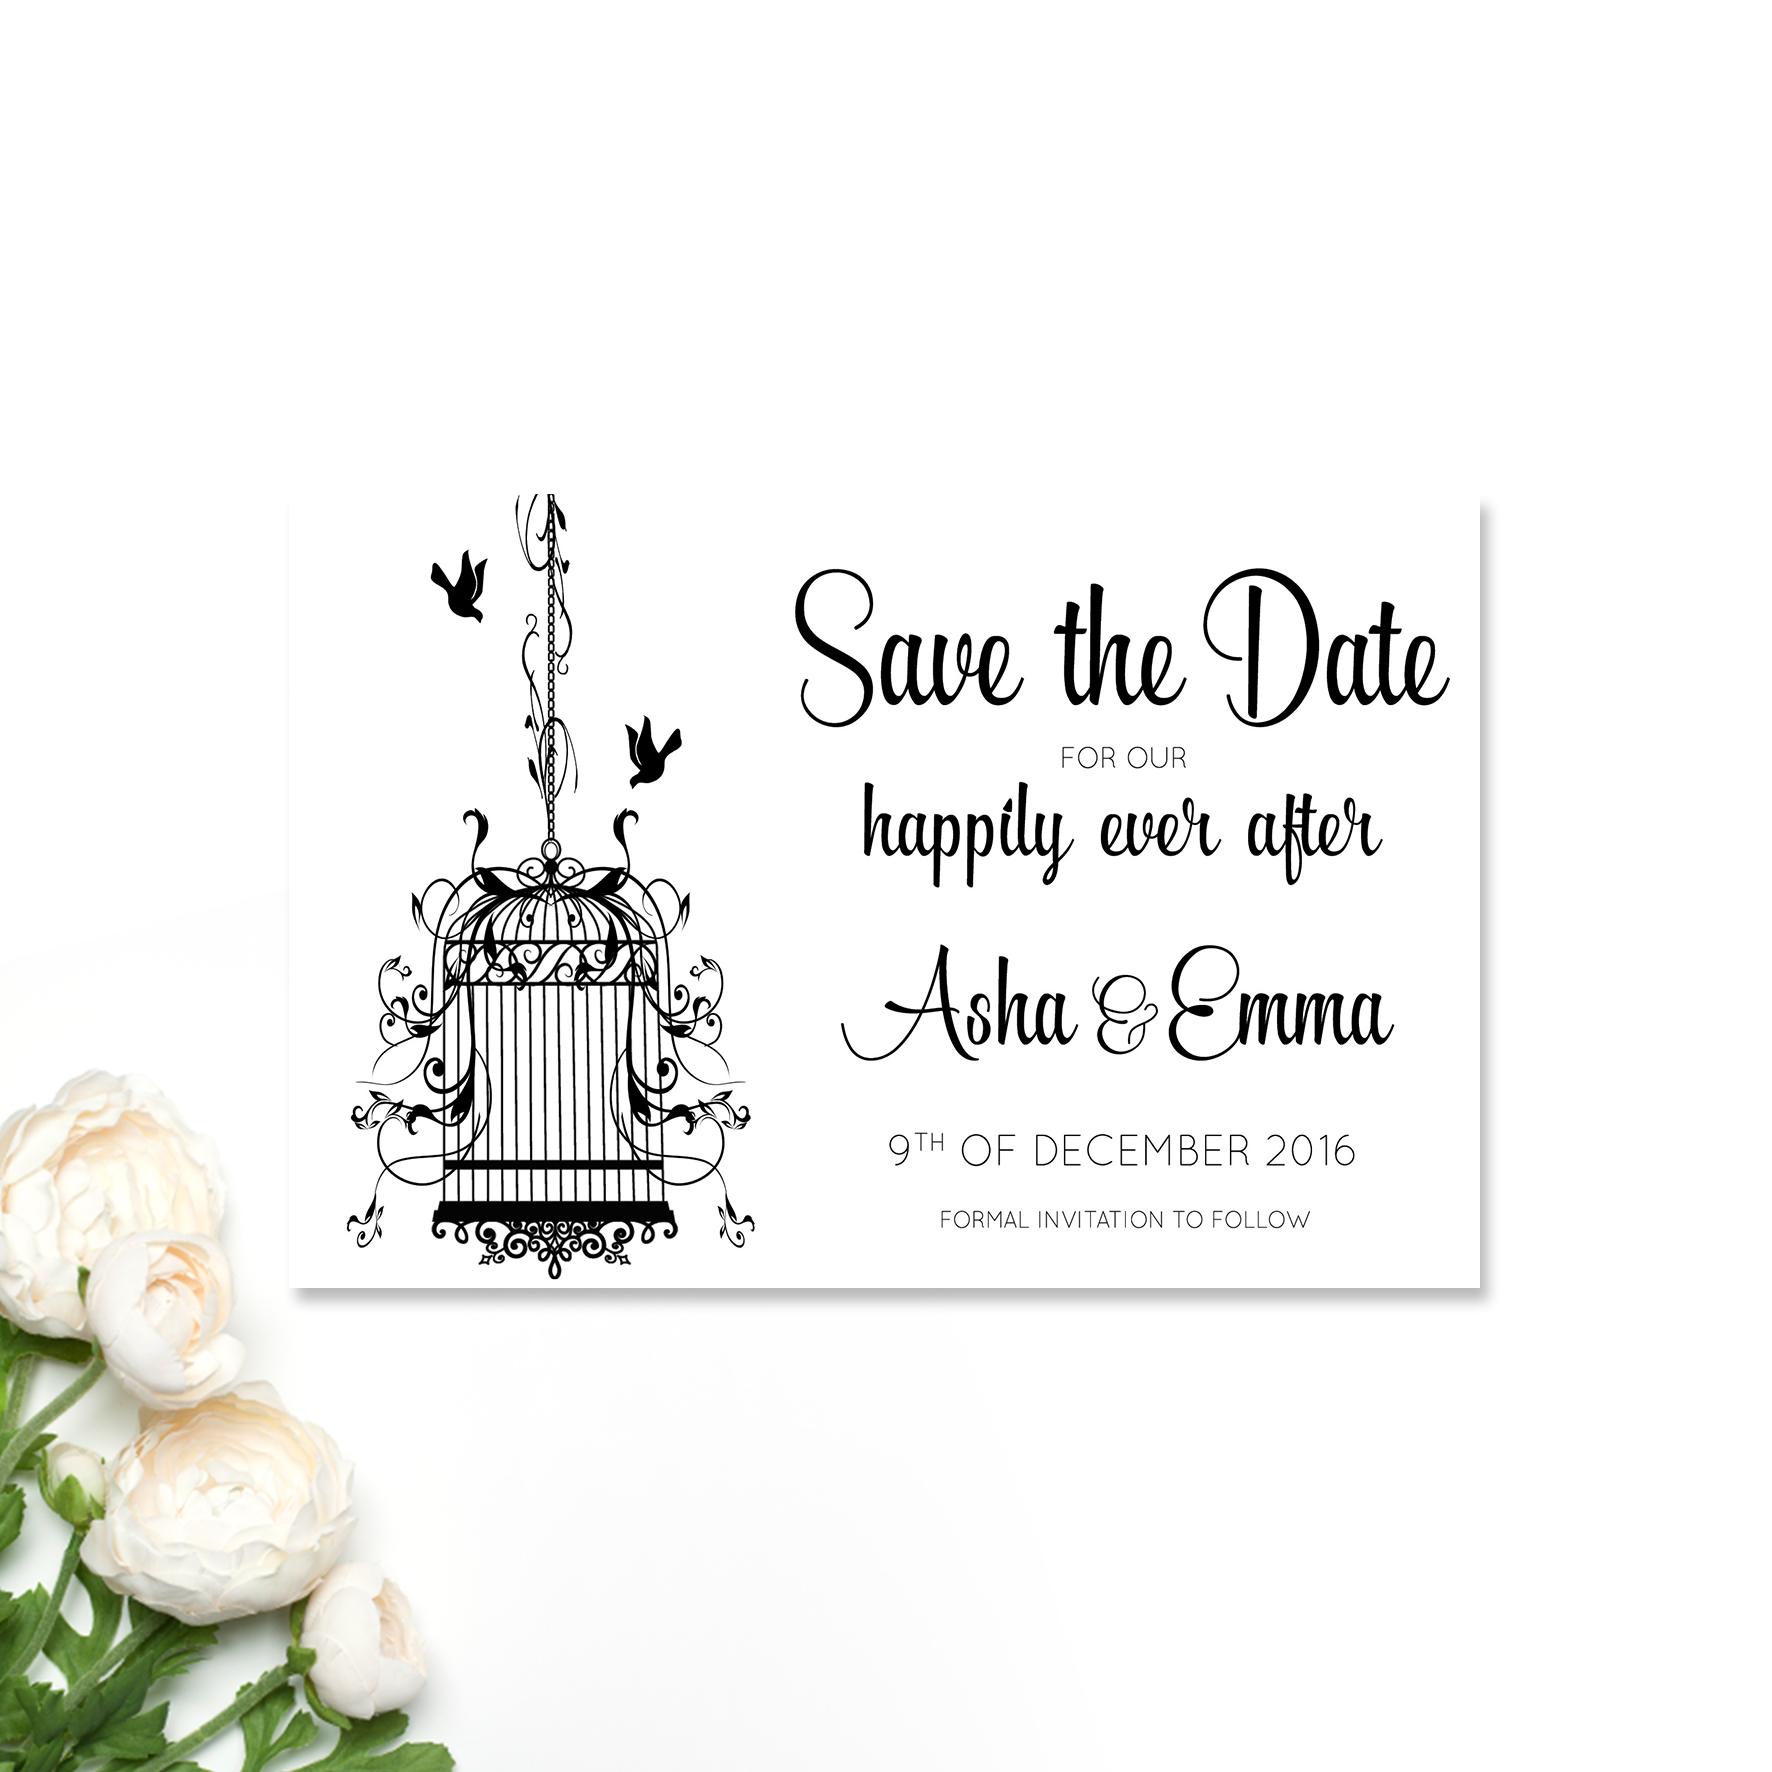 Asha + Emma Save the Date Card